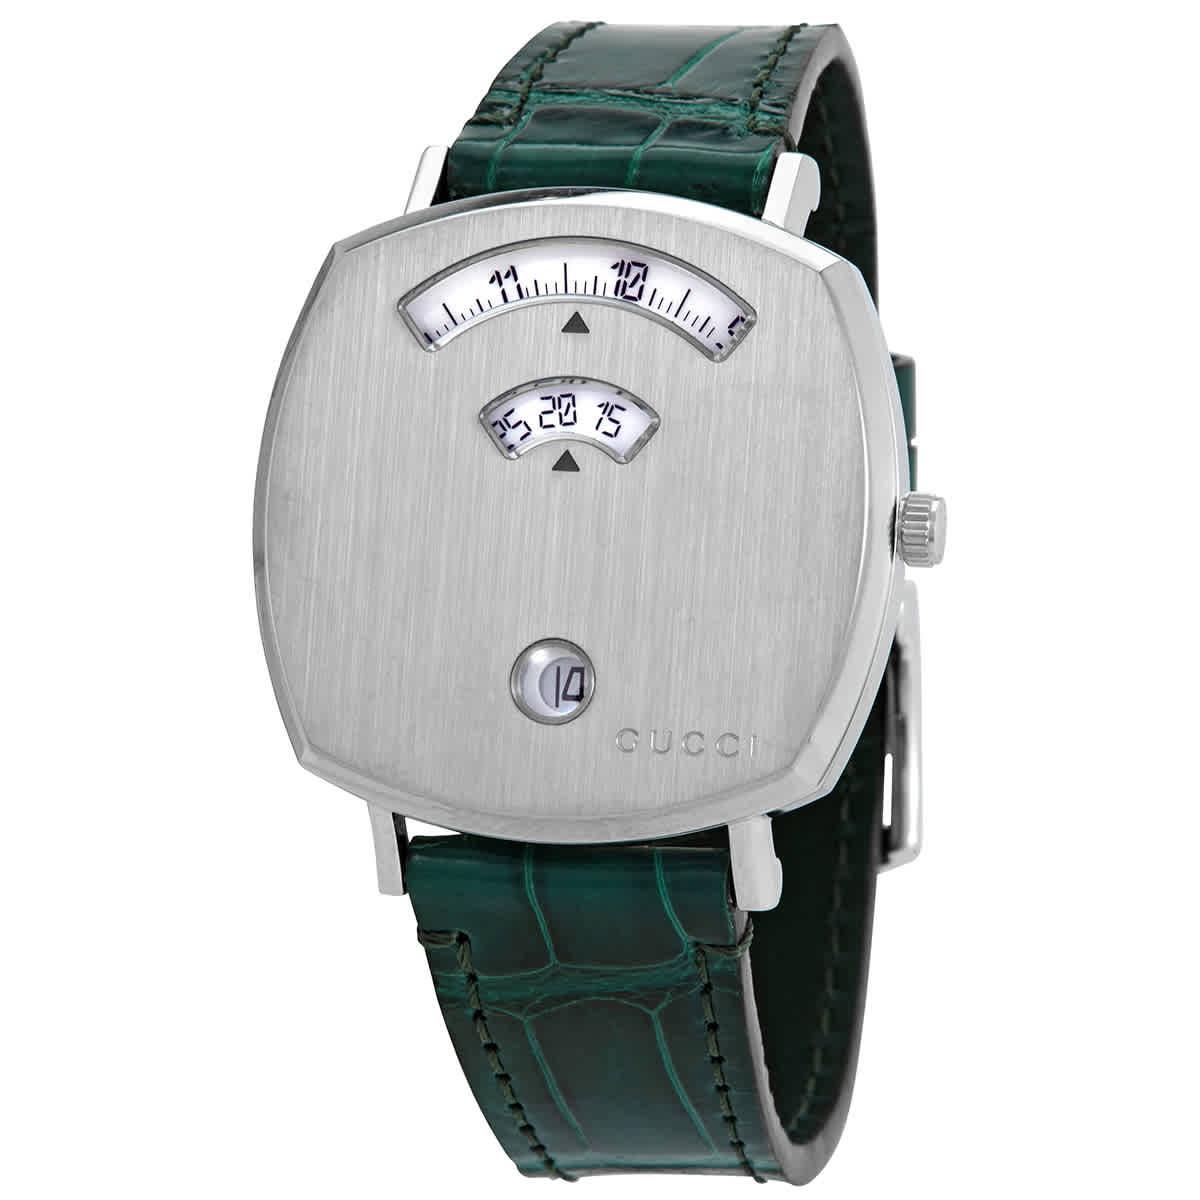 Gucci Grip Quartz Silver Dial Ladies Watch Ya157404 In Green